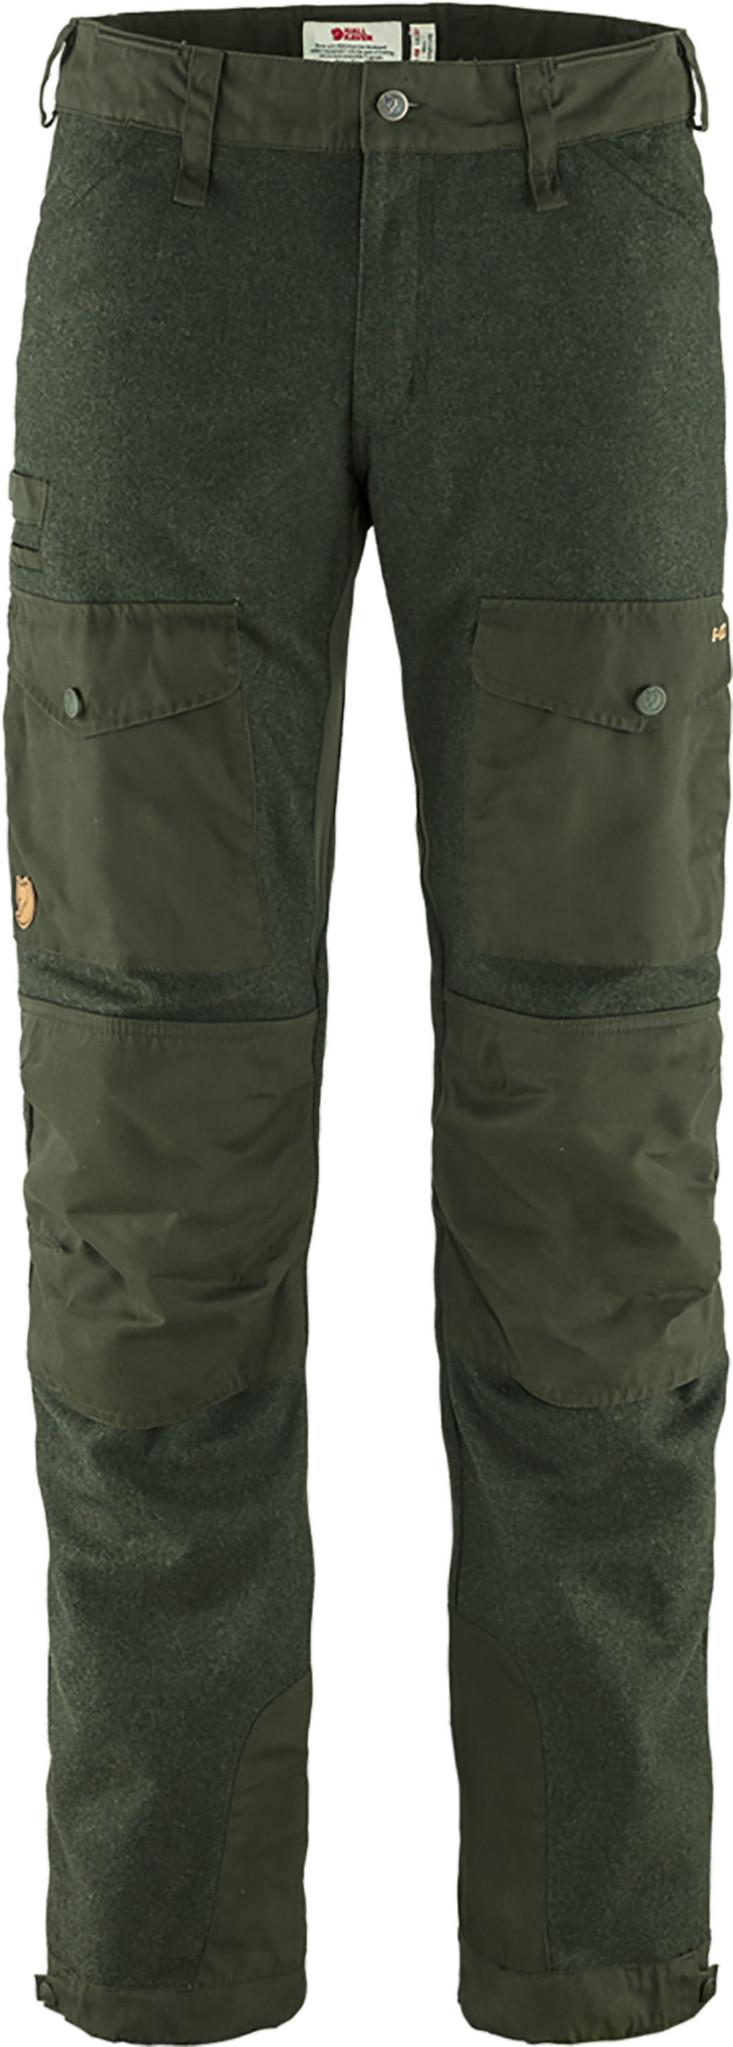 Fjällräven Värmland Wool Trousers M Deep Forest-1